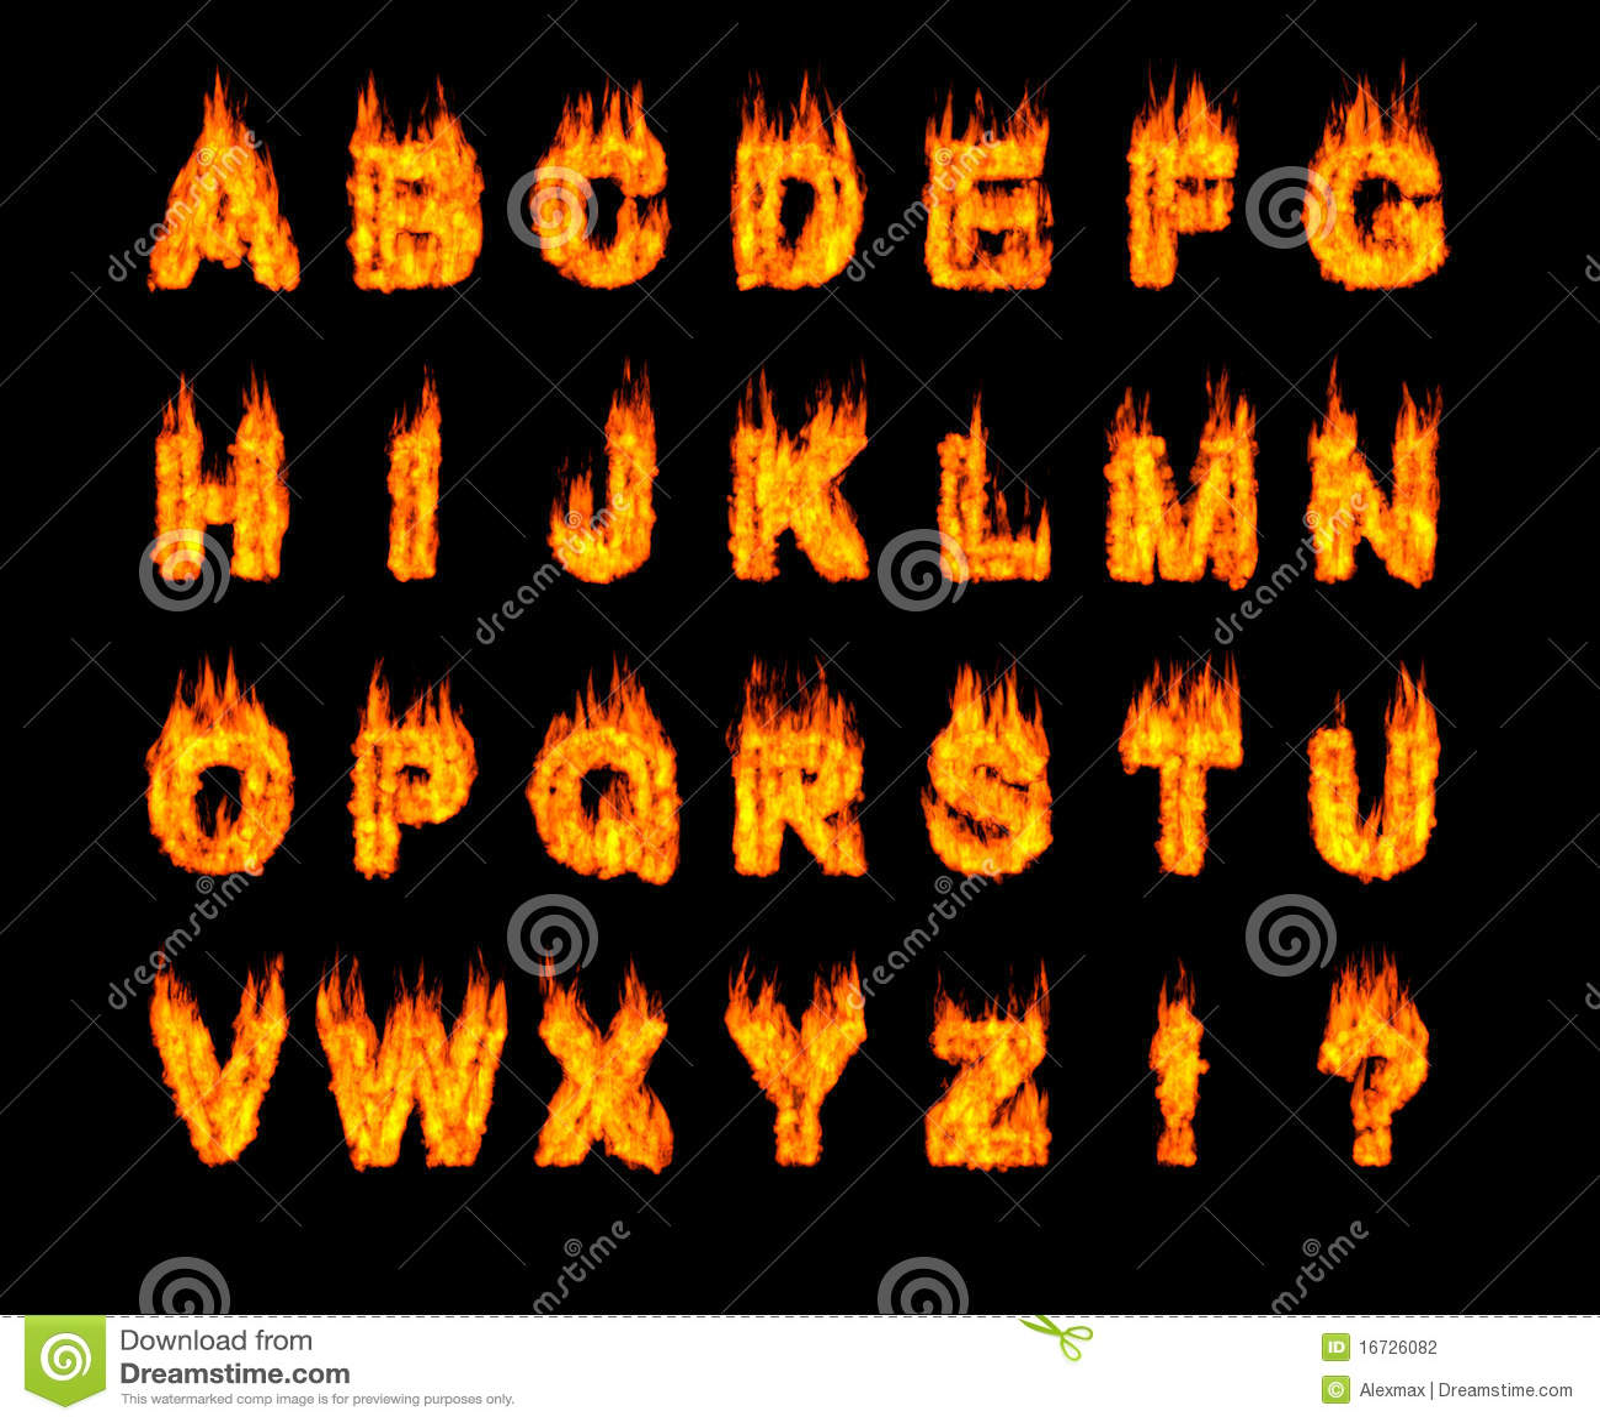 35 best Alphabet on fire images on Pinterest  Alphabet